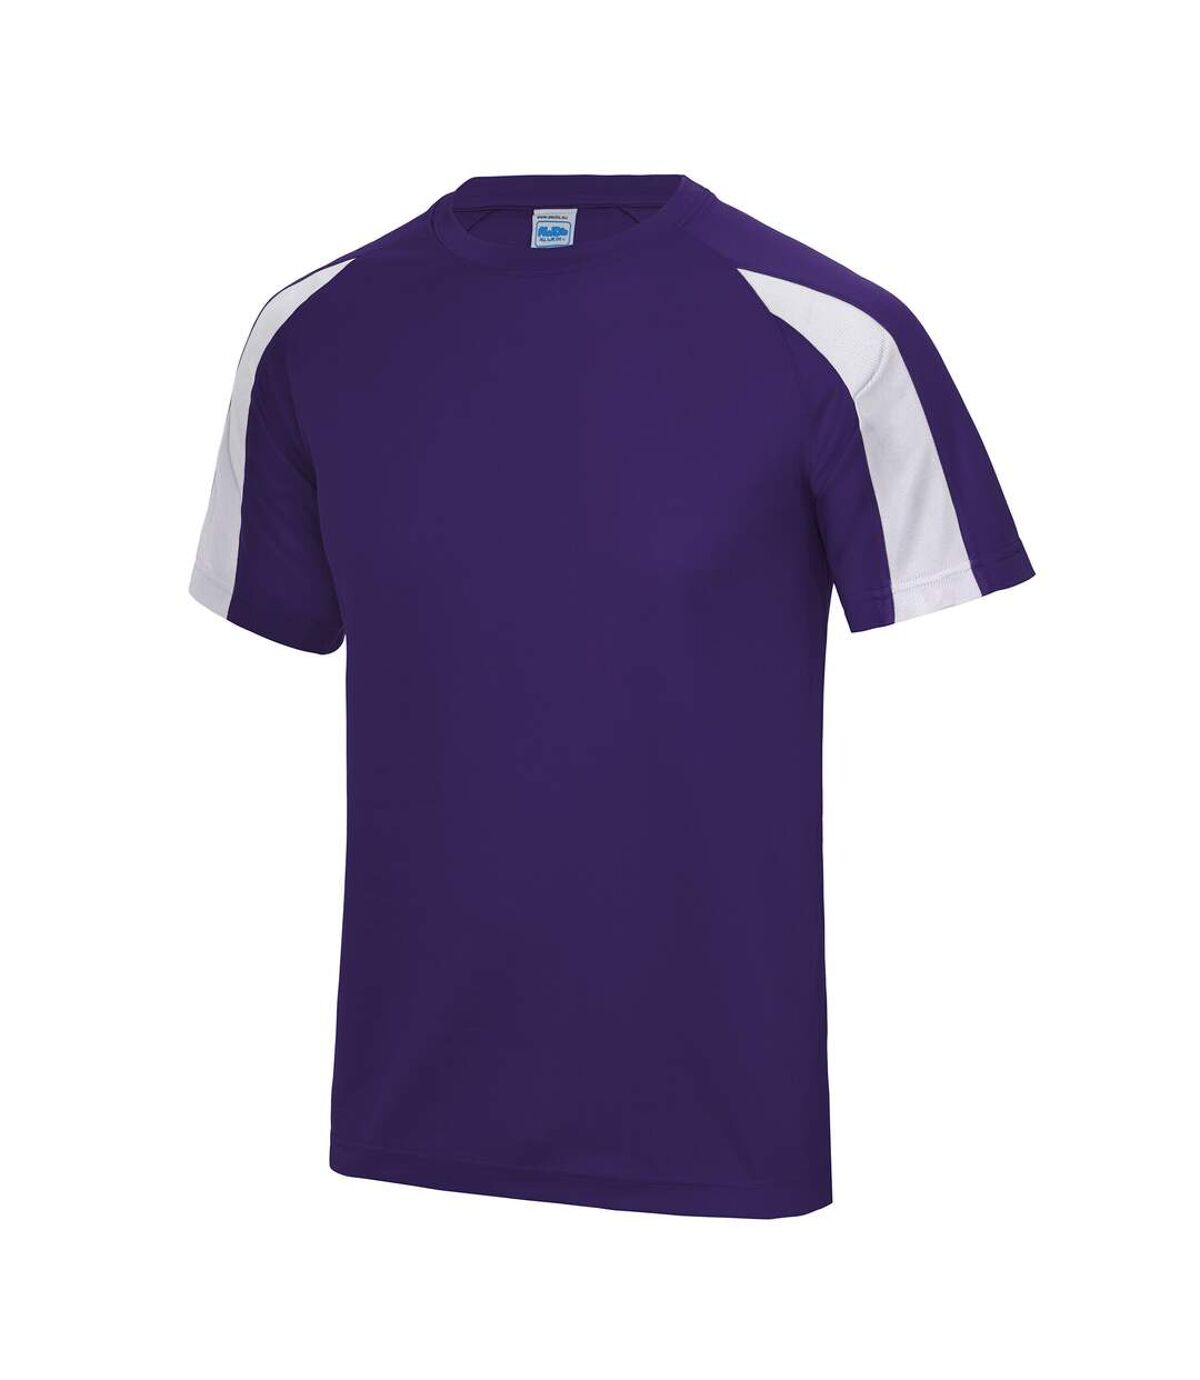 Just Cool Mens Contrast Cool Sports Plain T-Shirt (Purple/Arctic White) - UTRW685